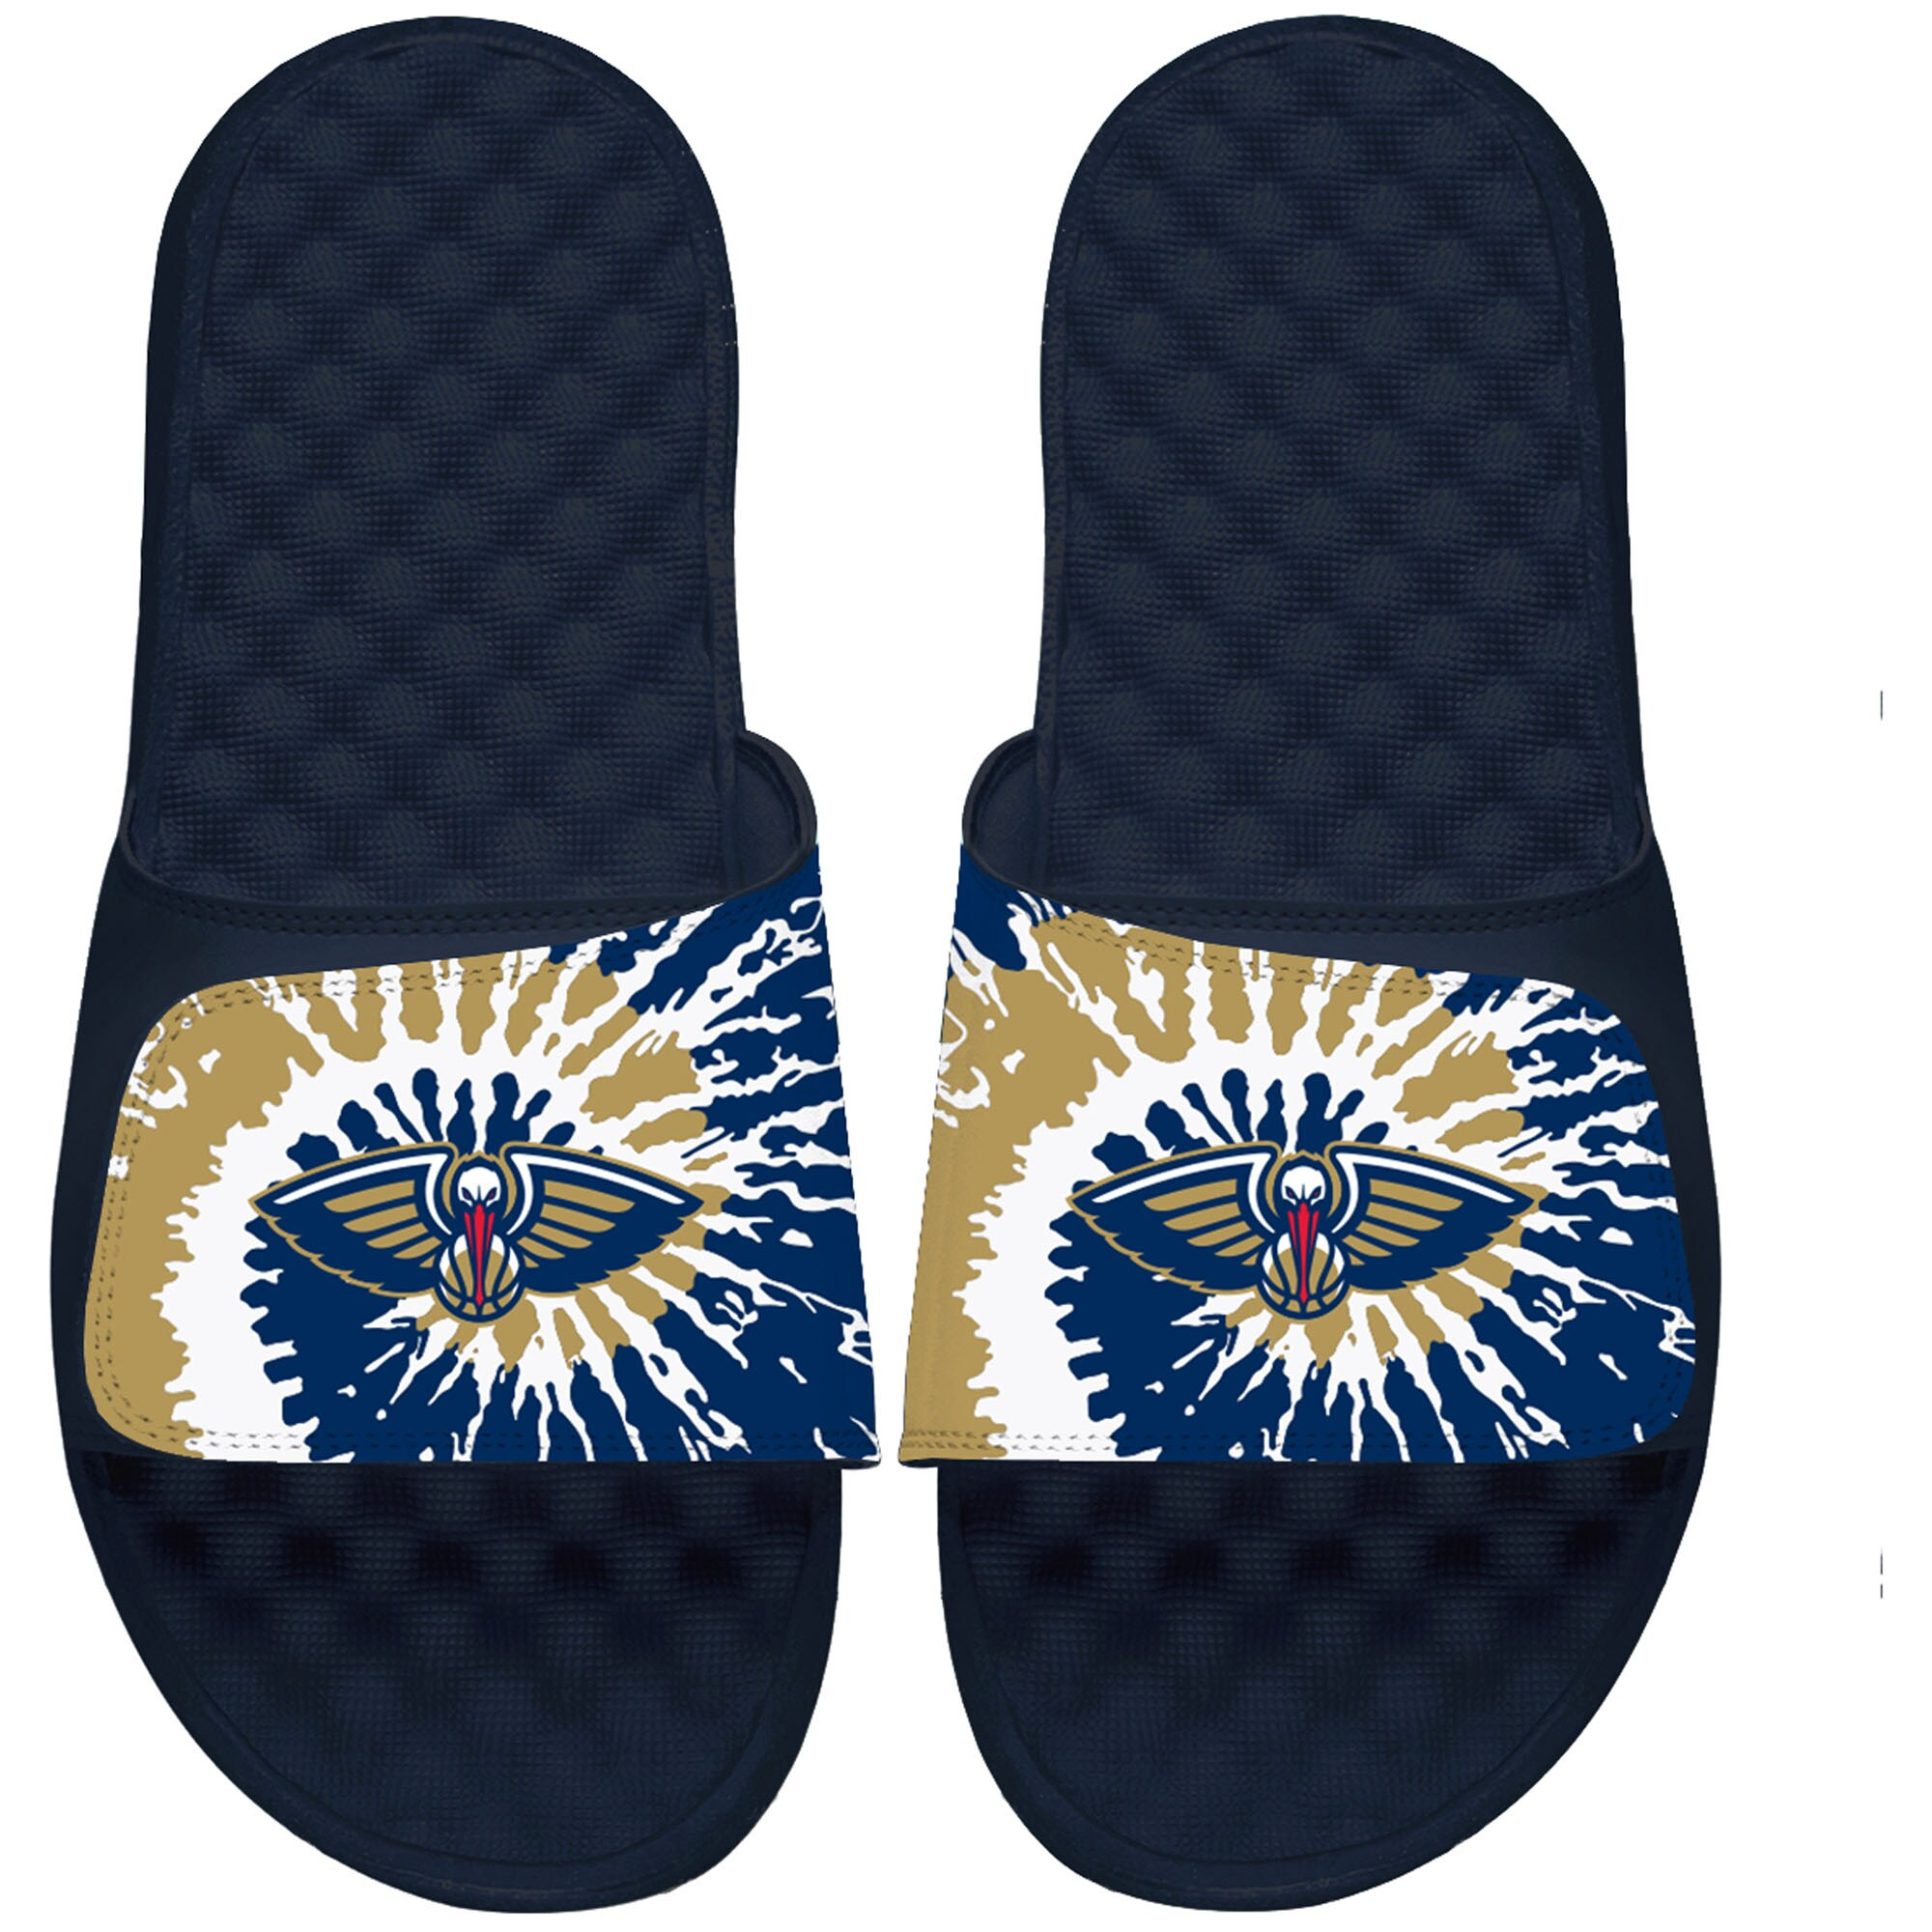 New Orleans Pelicans ISlide Youth Tie Dye Slide Sandals - Navy